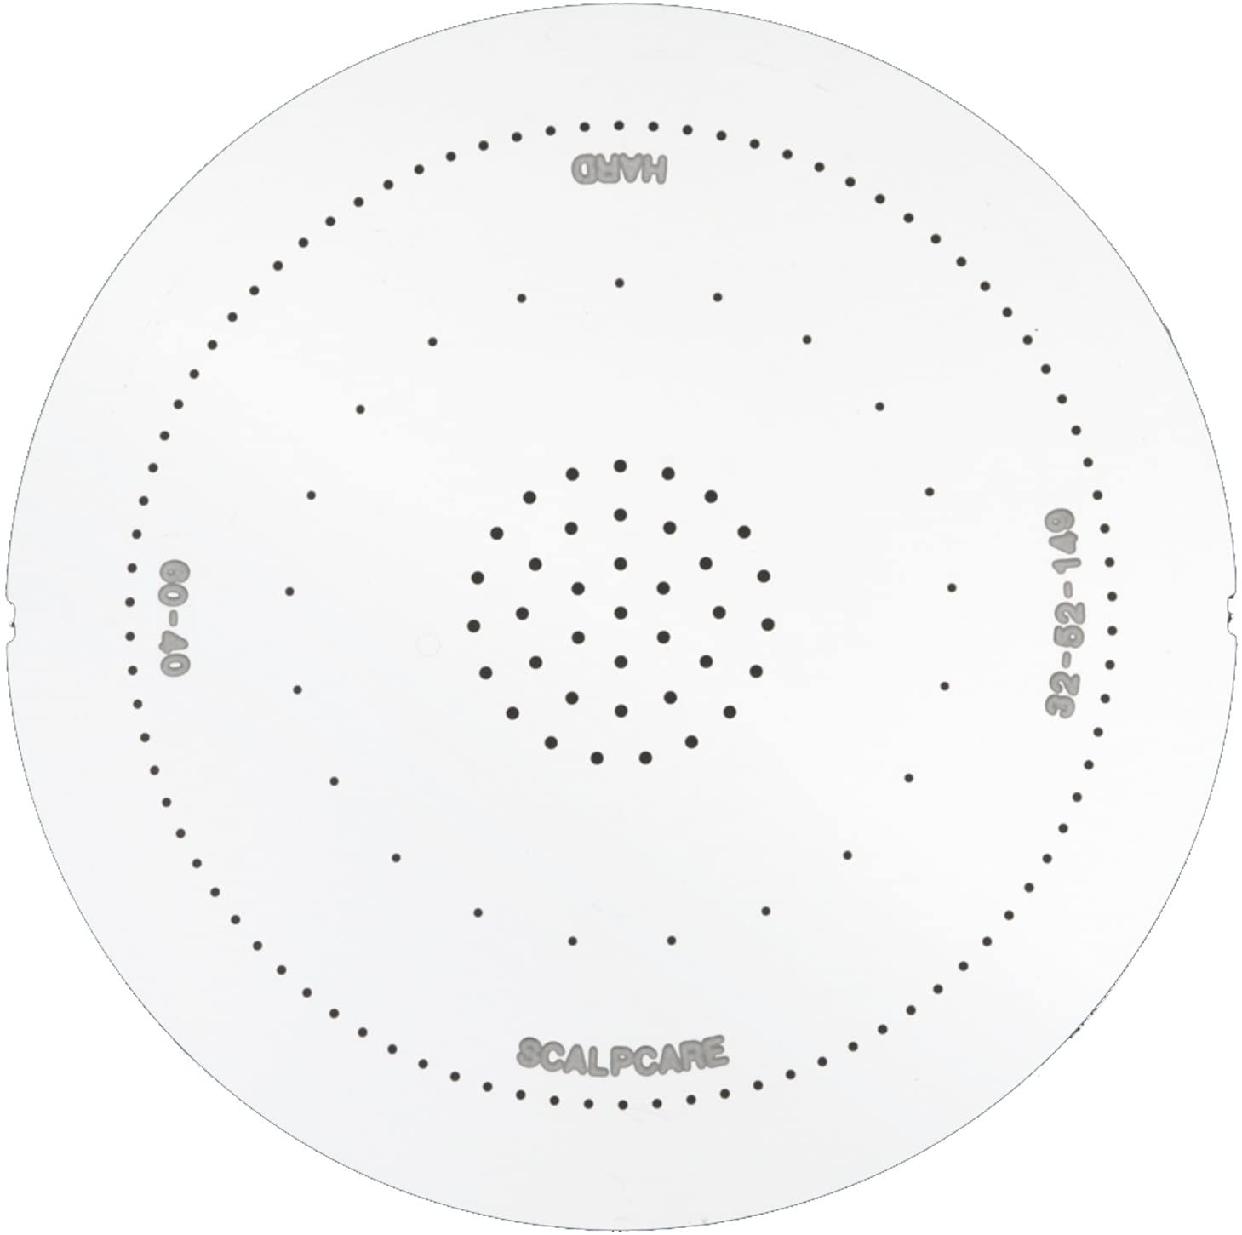 Arromic(アラミック)サロンスタイルシャワー/スカルプケアシャワー SSC-24Nの商品画像4